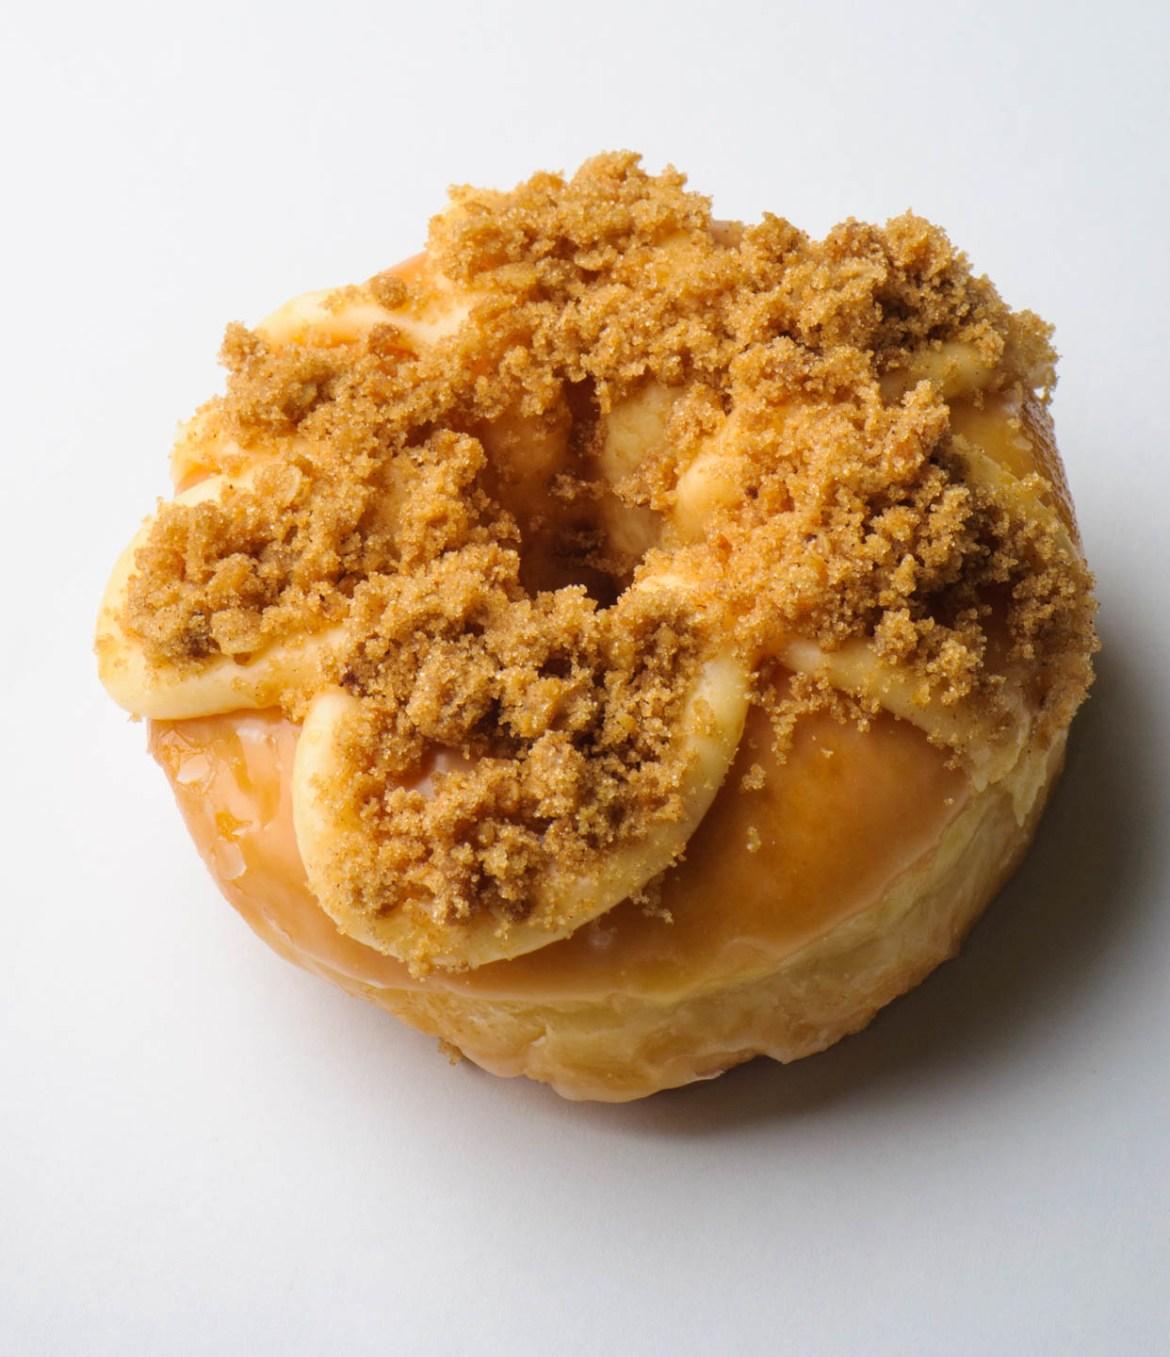 Cinnamon apple donut